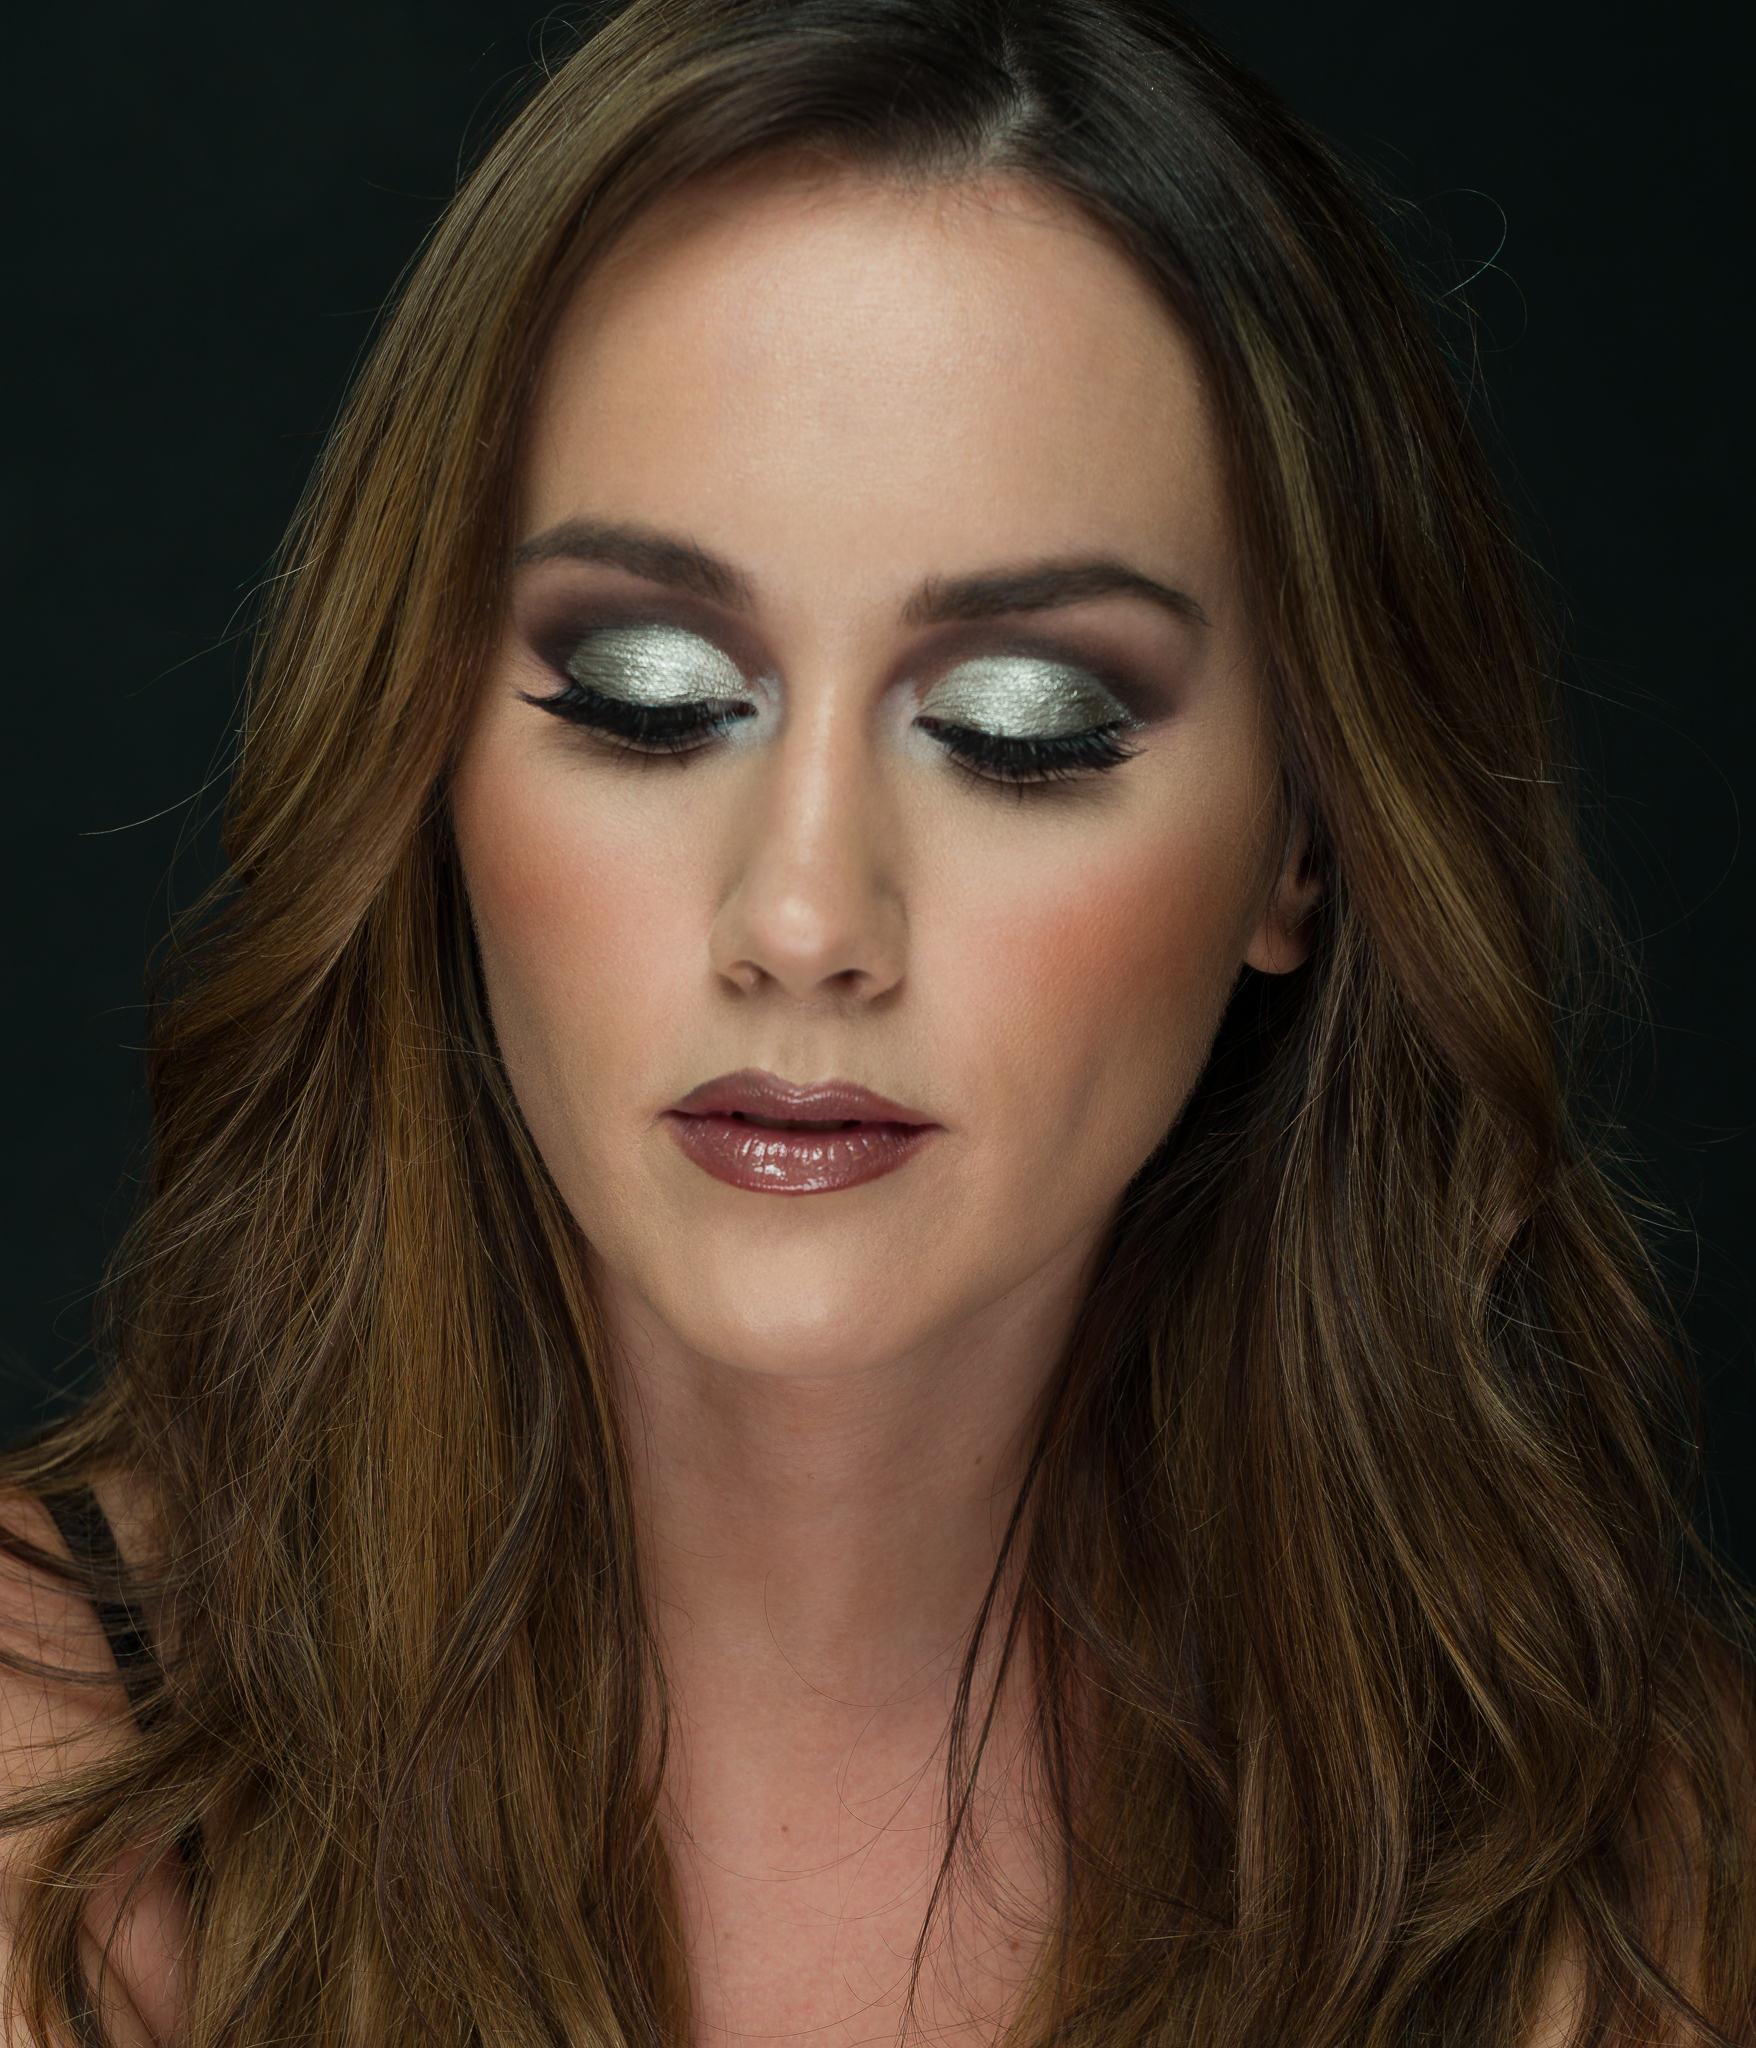 20170402 Erica Abke-Danielle Walsh-Beauty Shoot-1001147-Edit.jpg